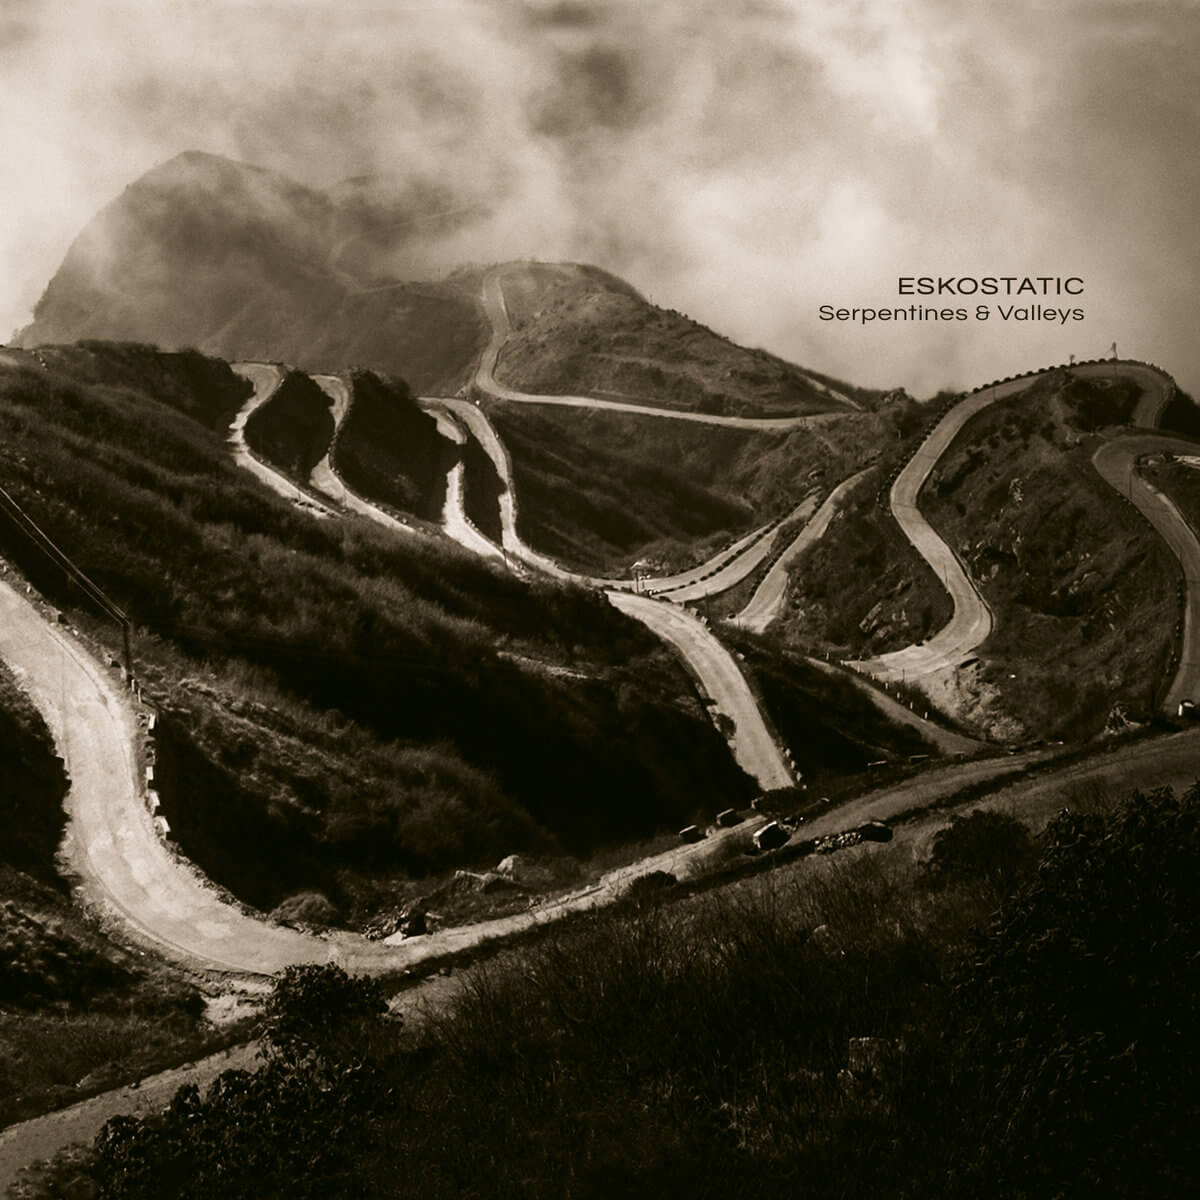 eskostatic serpentines valleys vinyl lp ultimae records